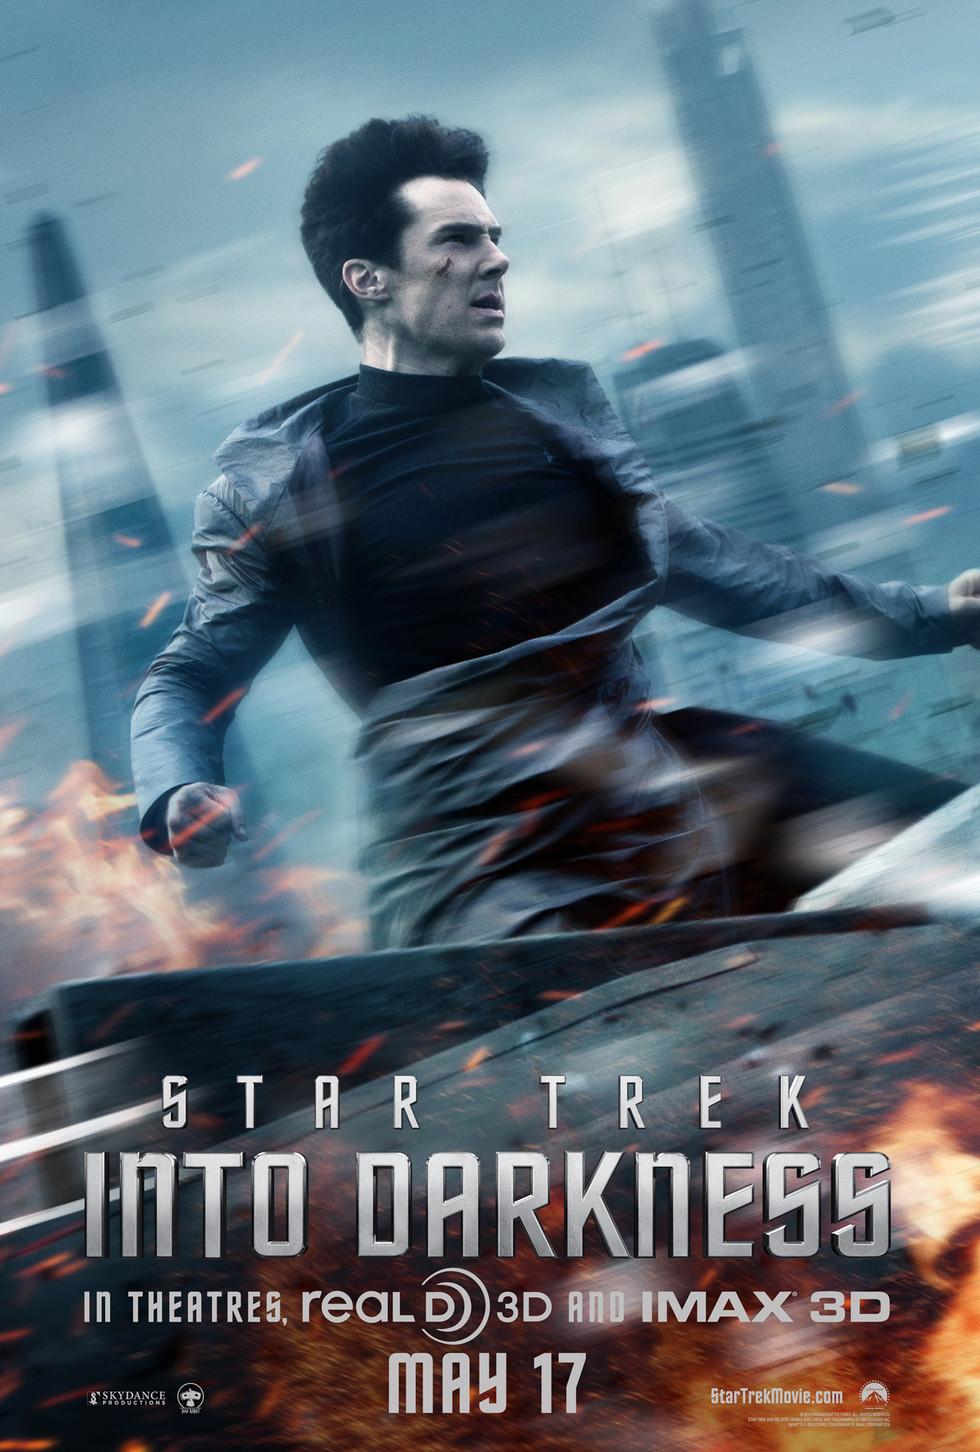 Star Trek Into Darkness - Movie Poster #4 (Large)